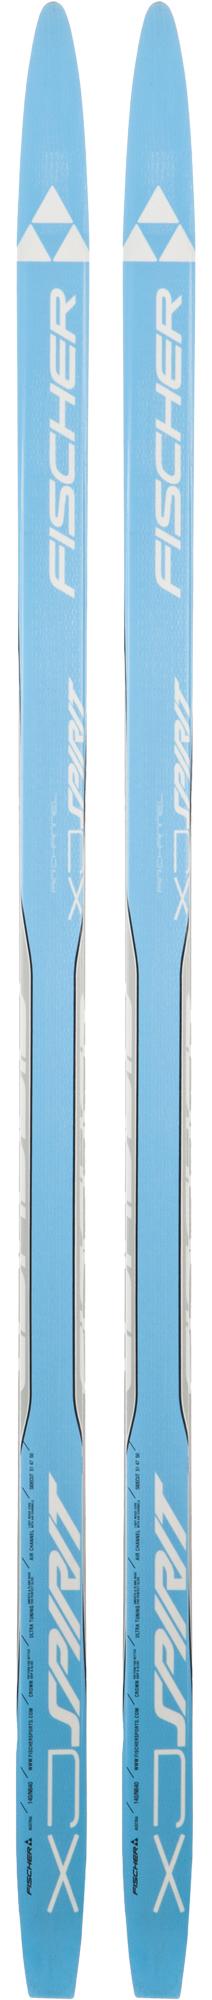 все цены на Fischer Лыжи беговые юниорские Fischer Spirit Crown, размер 170 онлайн